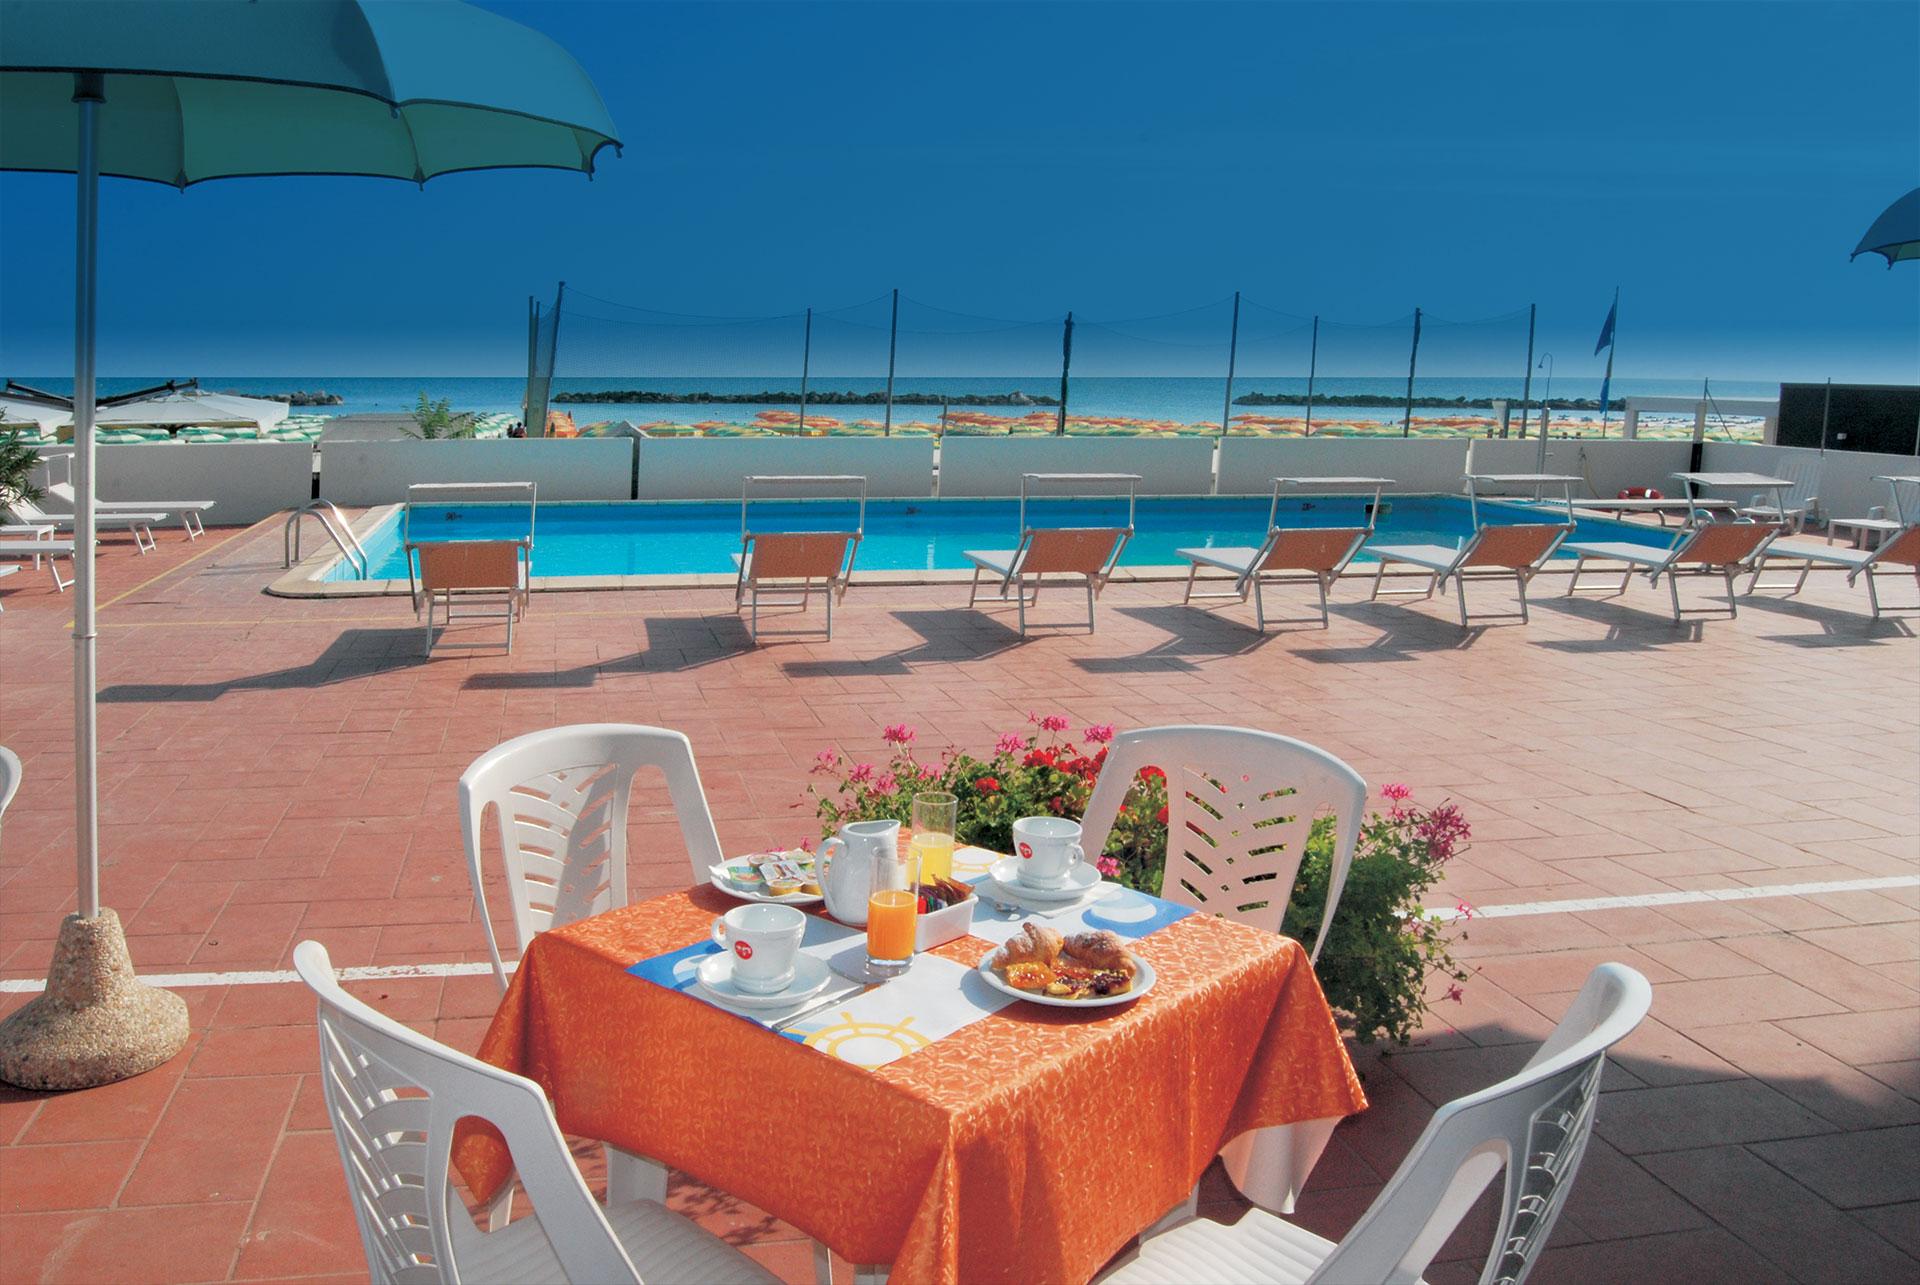 colazione in piscina hotel embassy